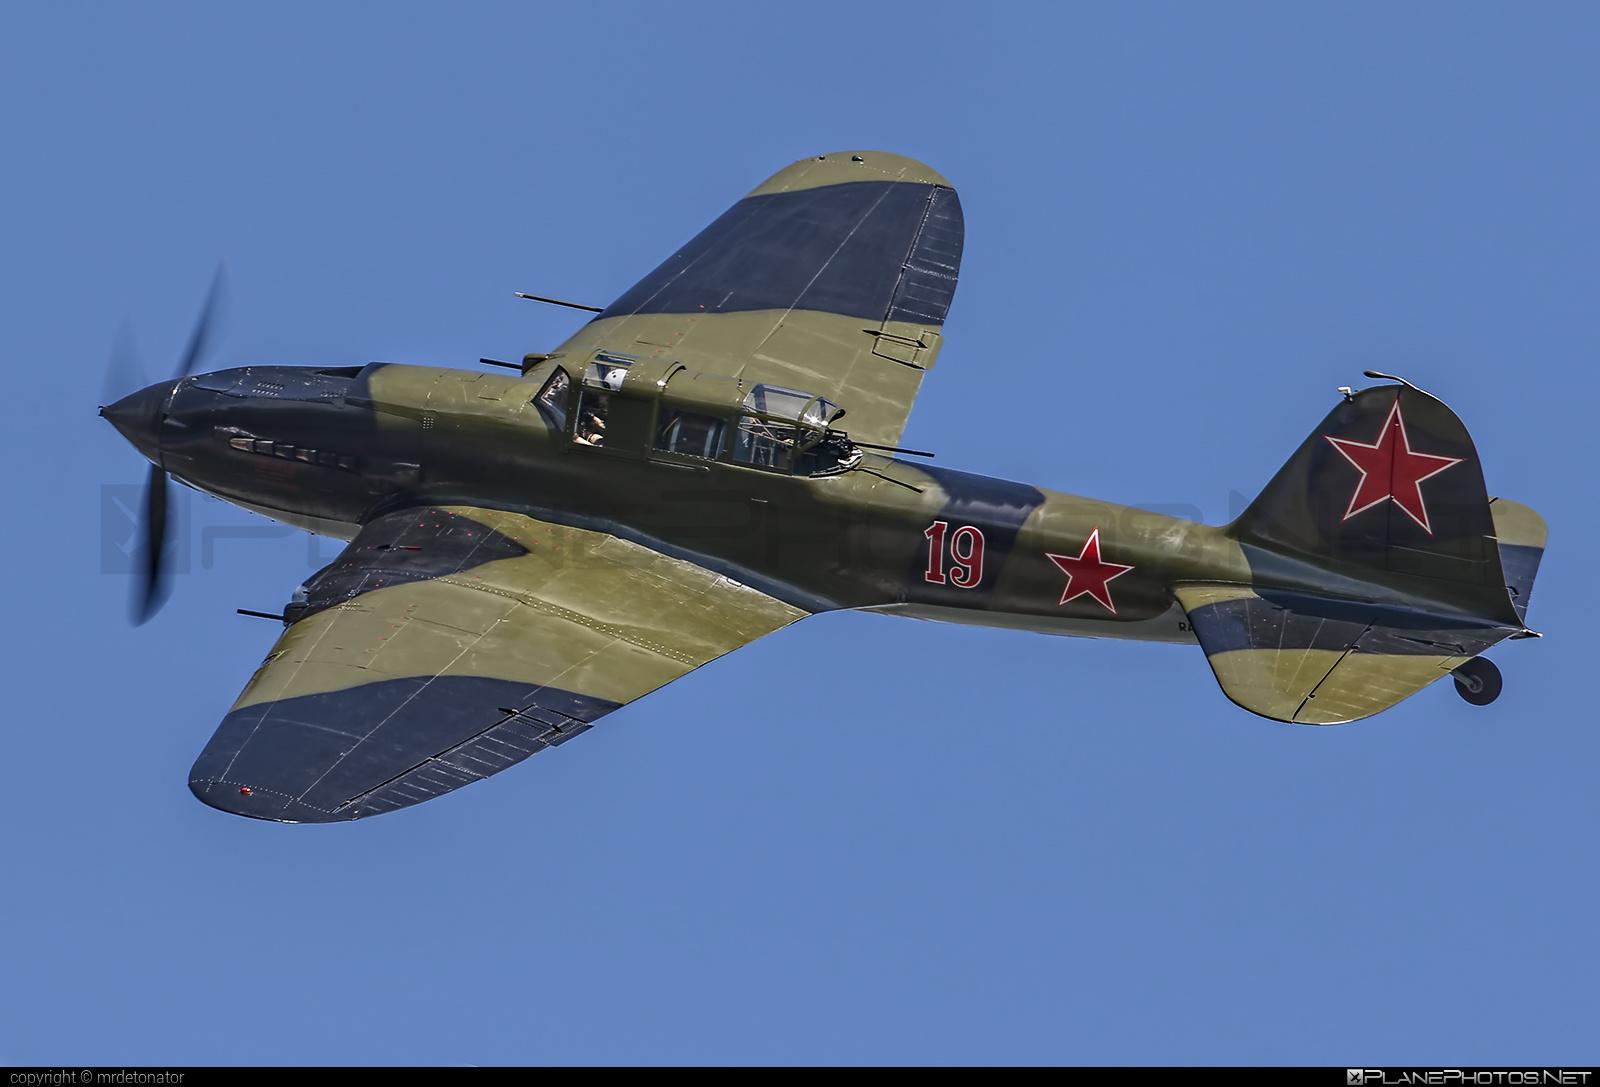 Ilyushin Il-2 Sturmovik - RA-2783G operated by Siberian Aeronautical Research Institute (SibNIA) #il2 #ilyushin #maks2017 #shturmovik #sturmovik